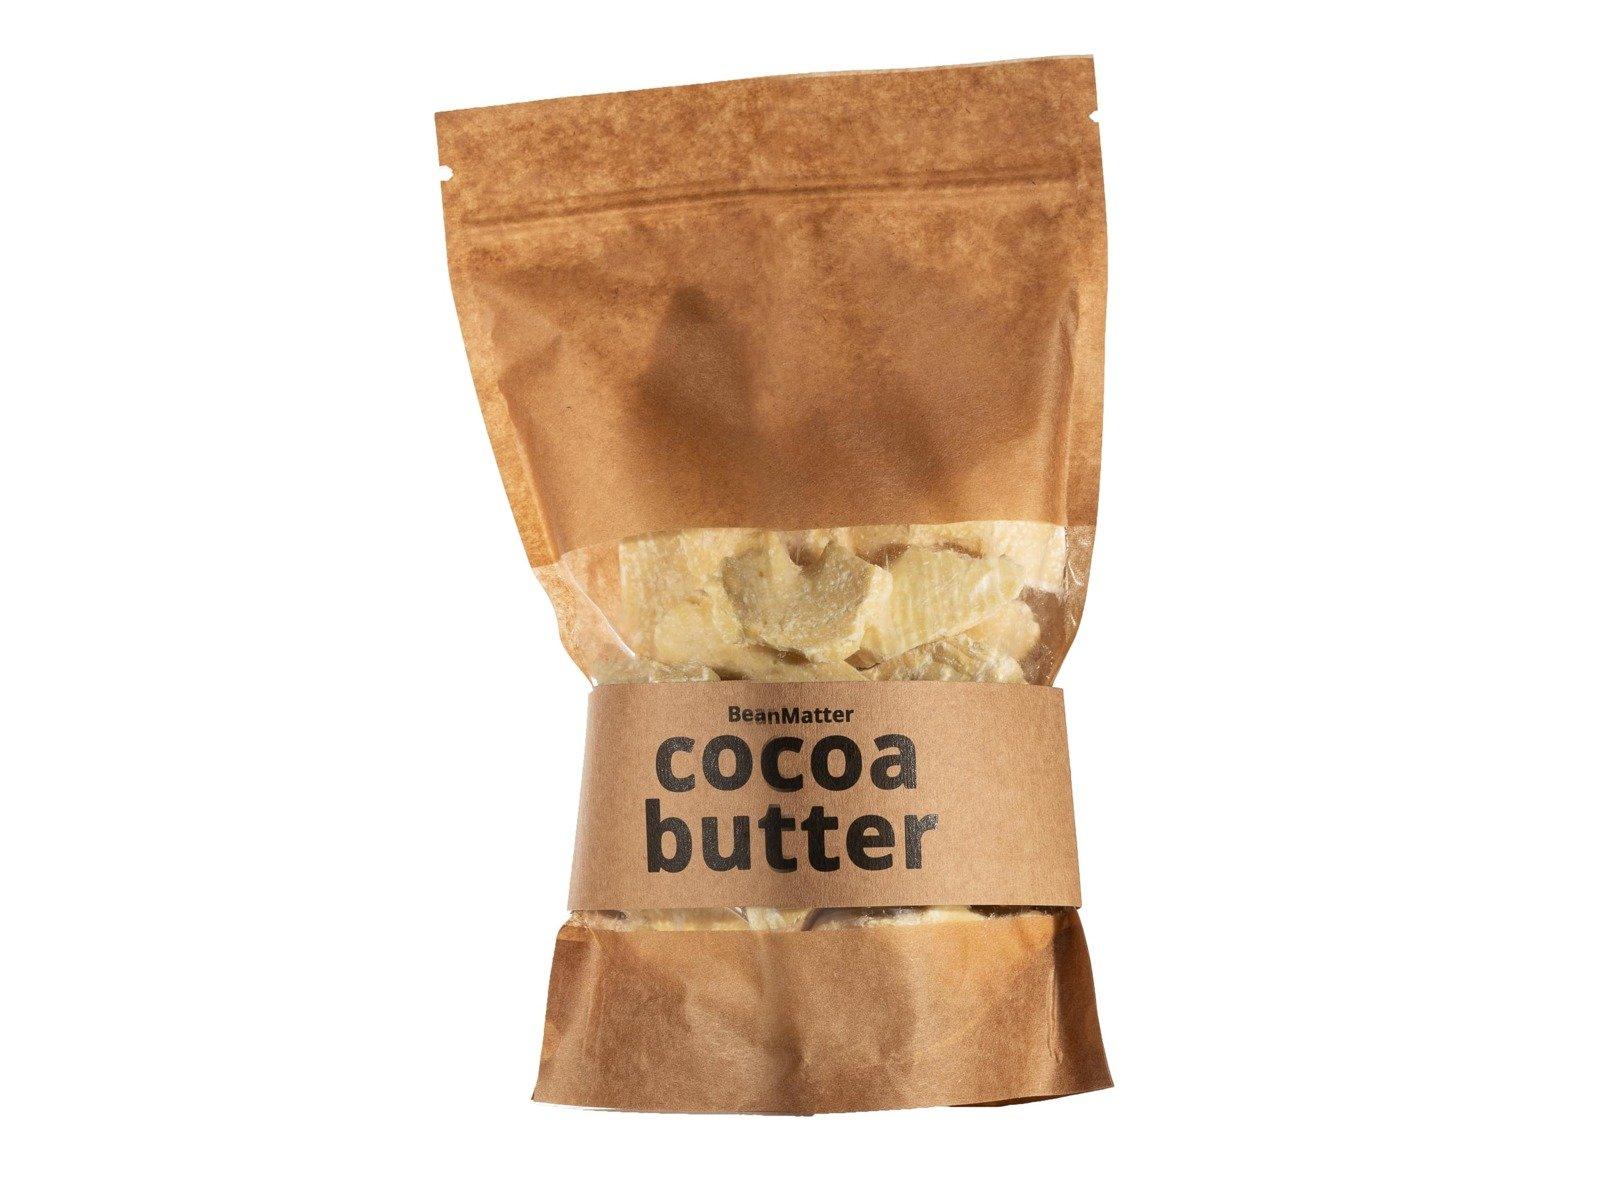 Cocoa Butter - 500g - Natural Unrefined Cacao Butter Ecuador Food Grade